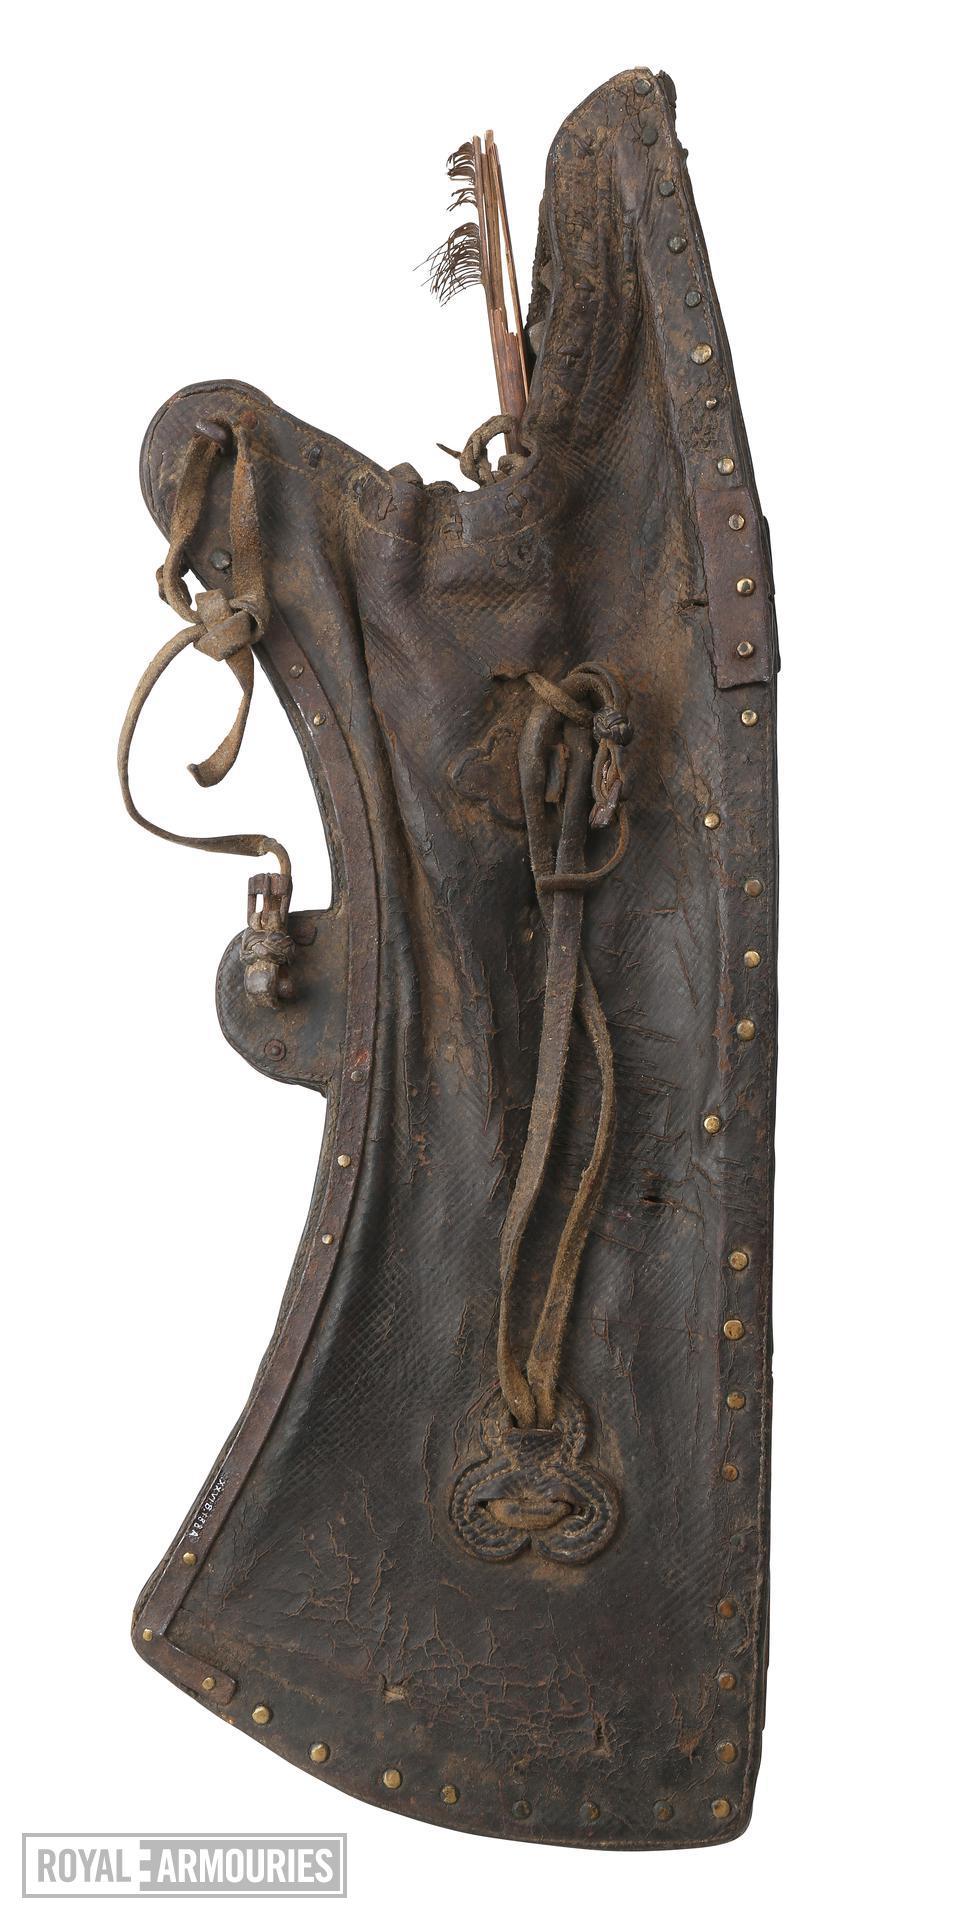 quiver and arrow, 17th/18th century. XXVIB.188